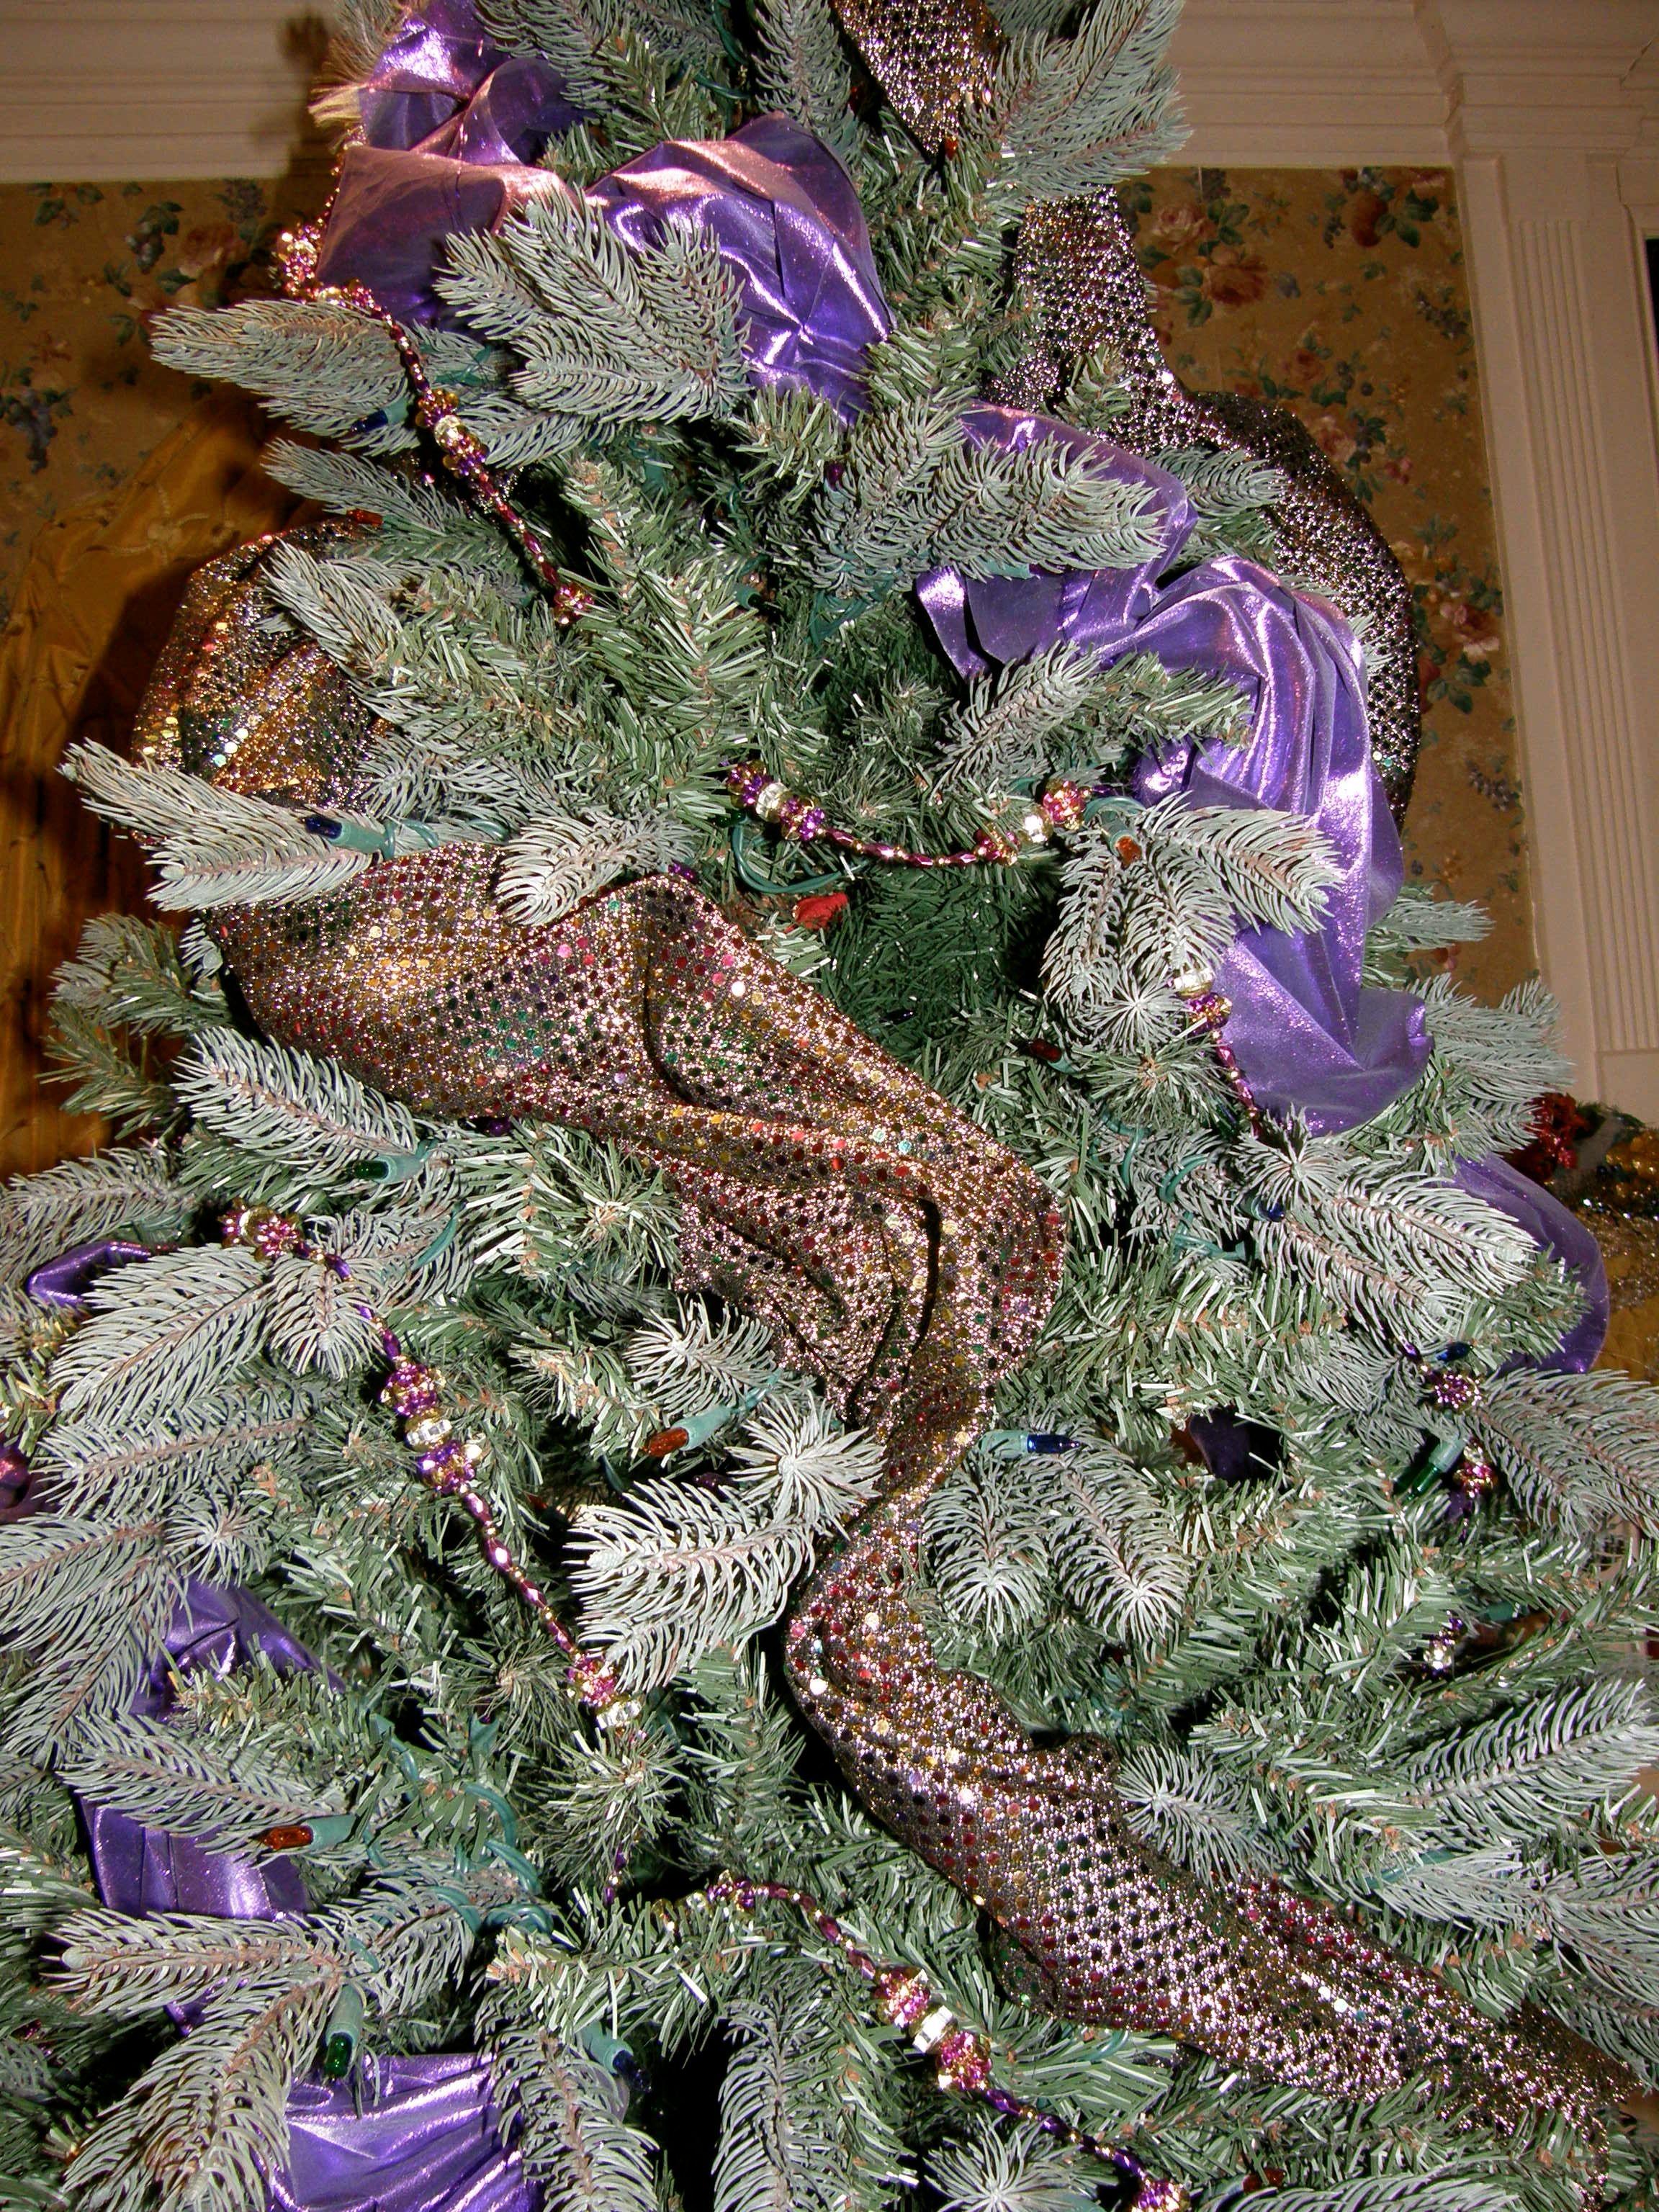 Christmas Decorations 3 – Boudoir Tree | TechNeats